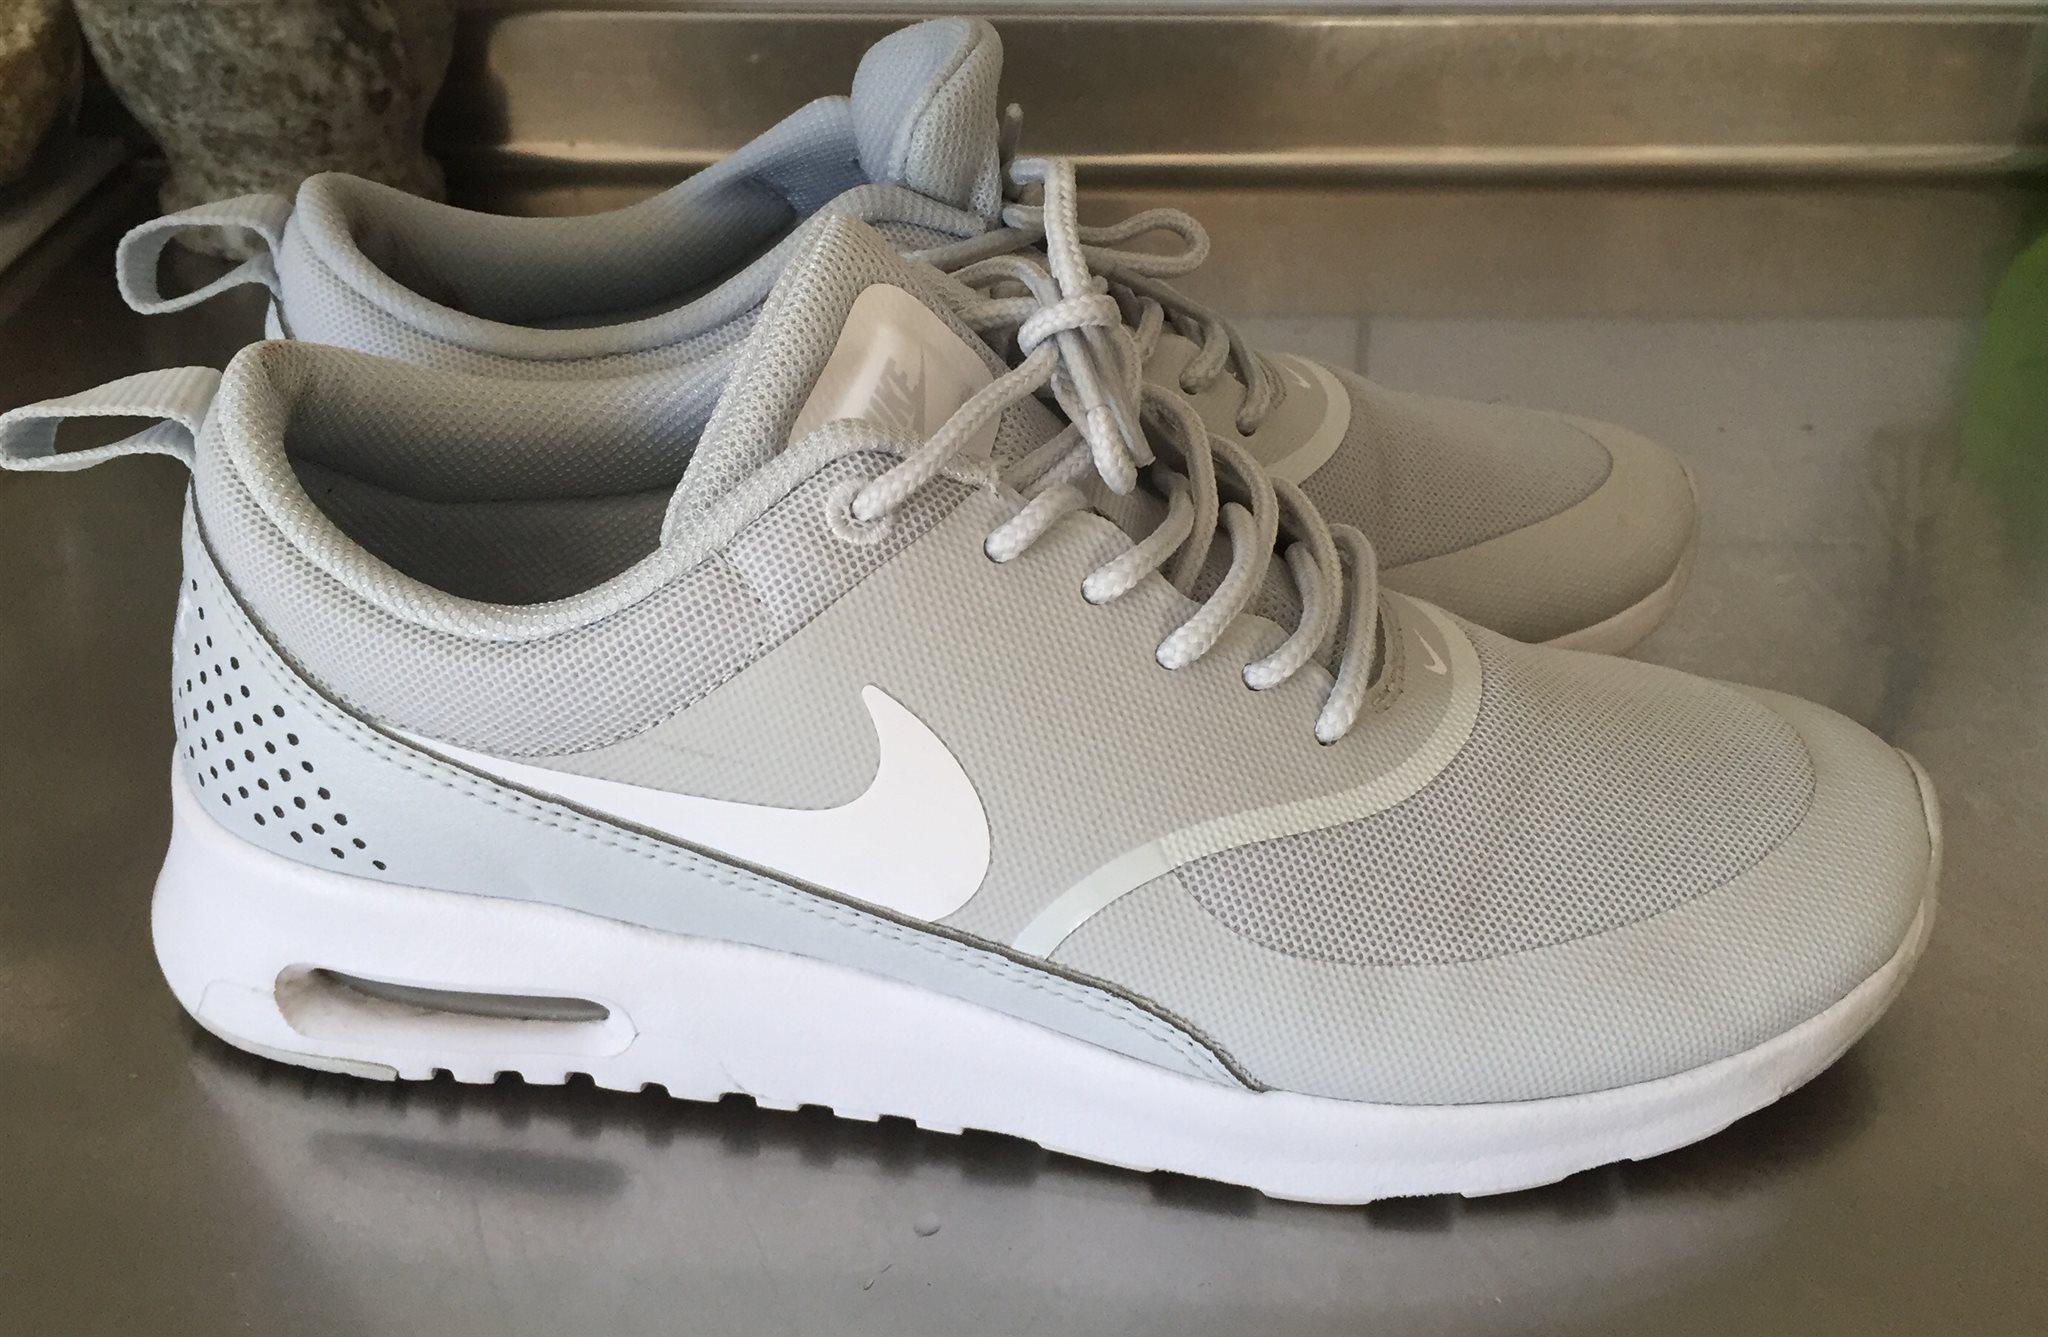 premium selection 5c37a 43298 Thea Nike Storlek 39 Sneakers Använda Gråvita På Knappt zpgqnBExw